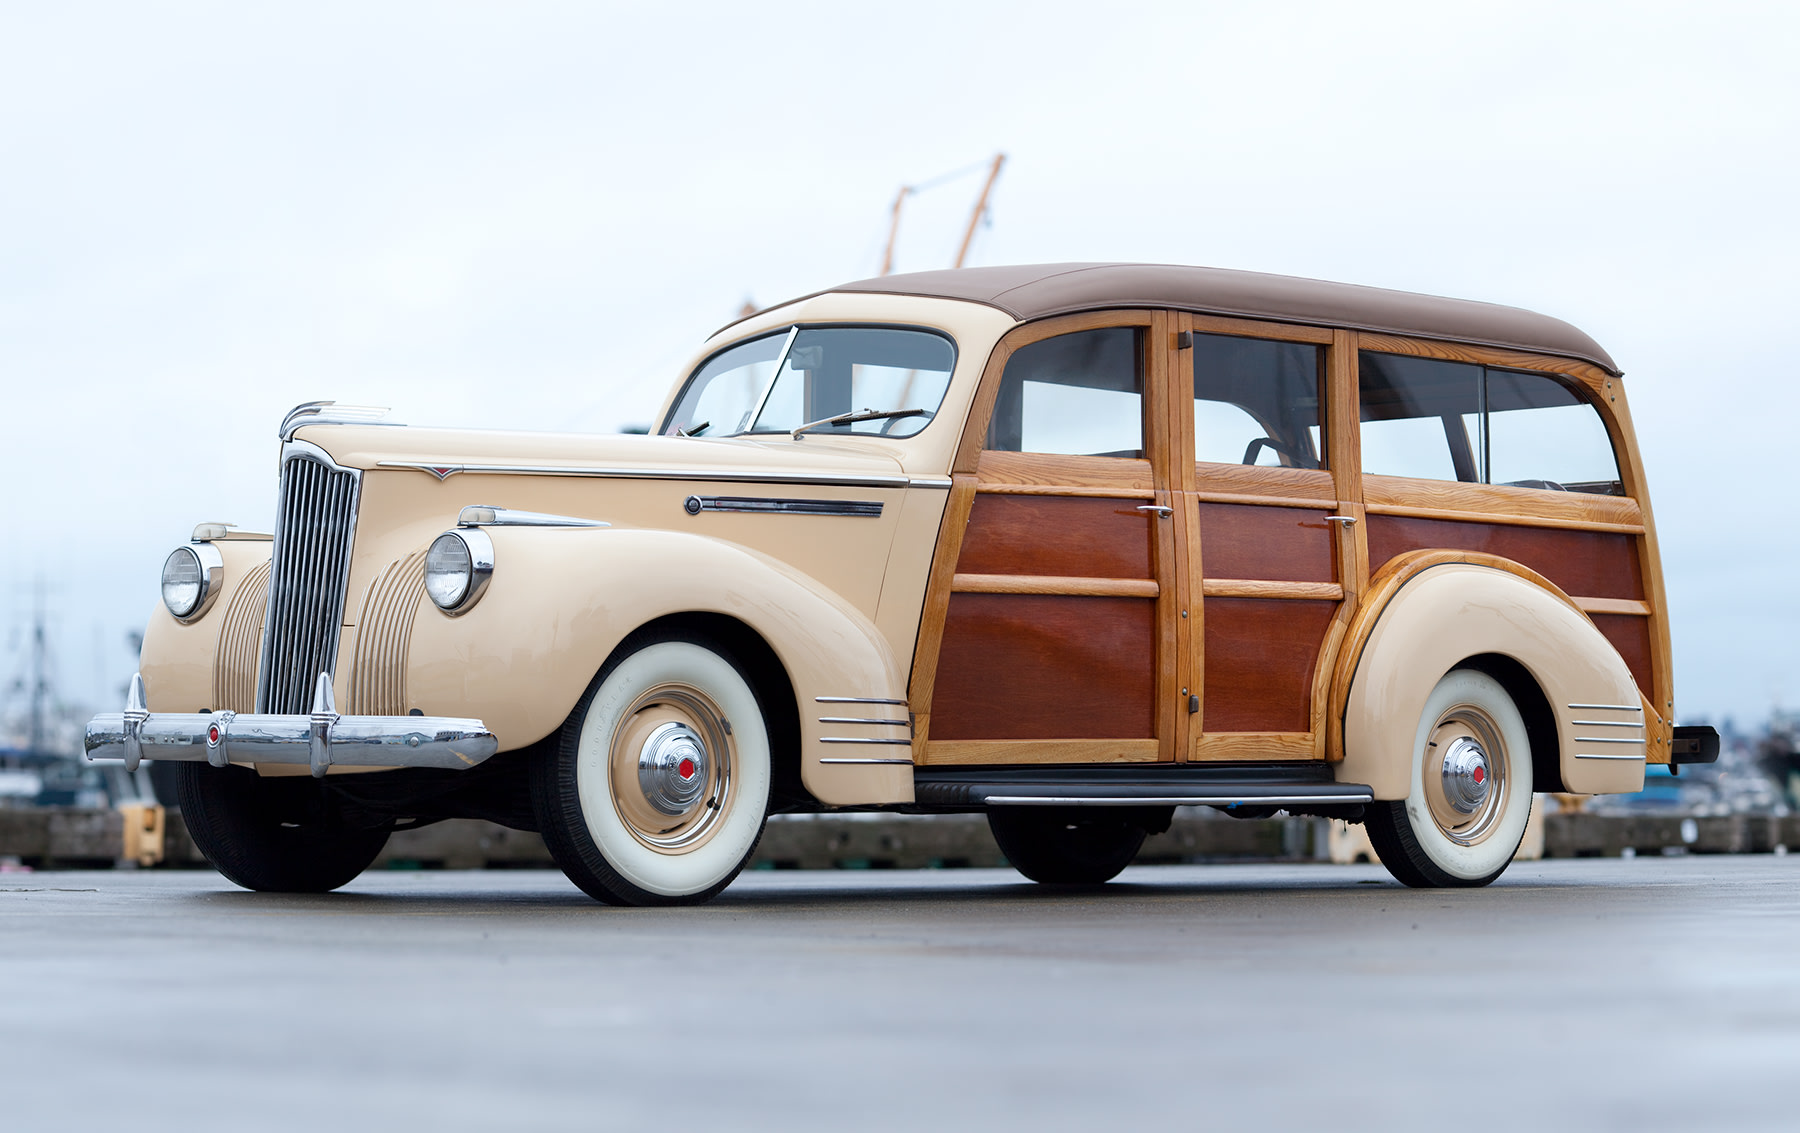 1941 Packard 110 Station Wagon